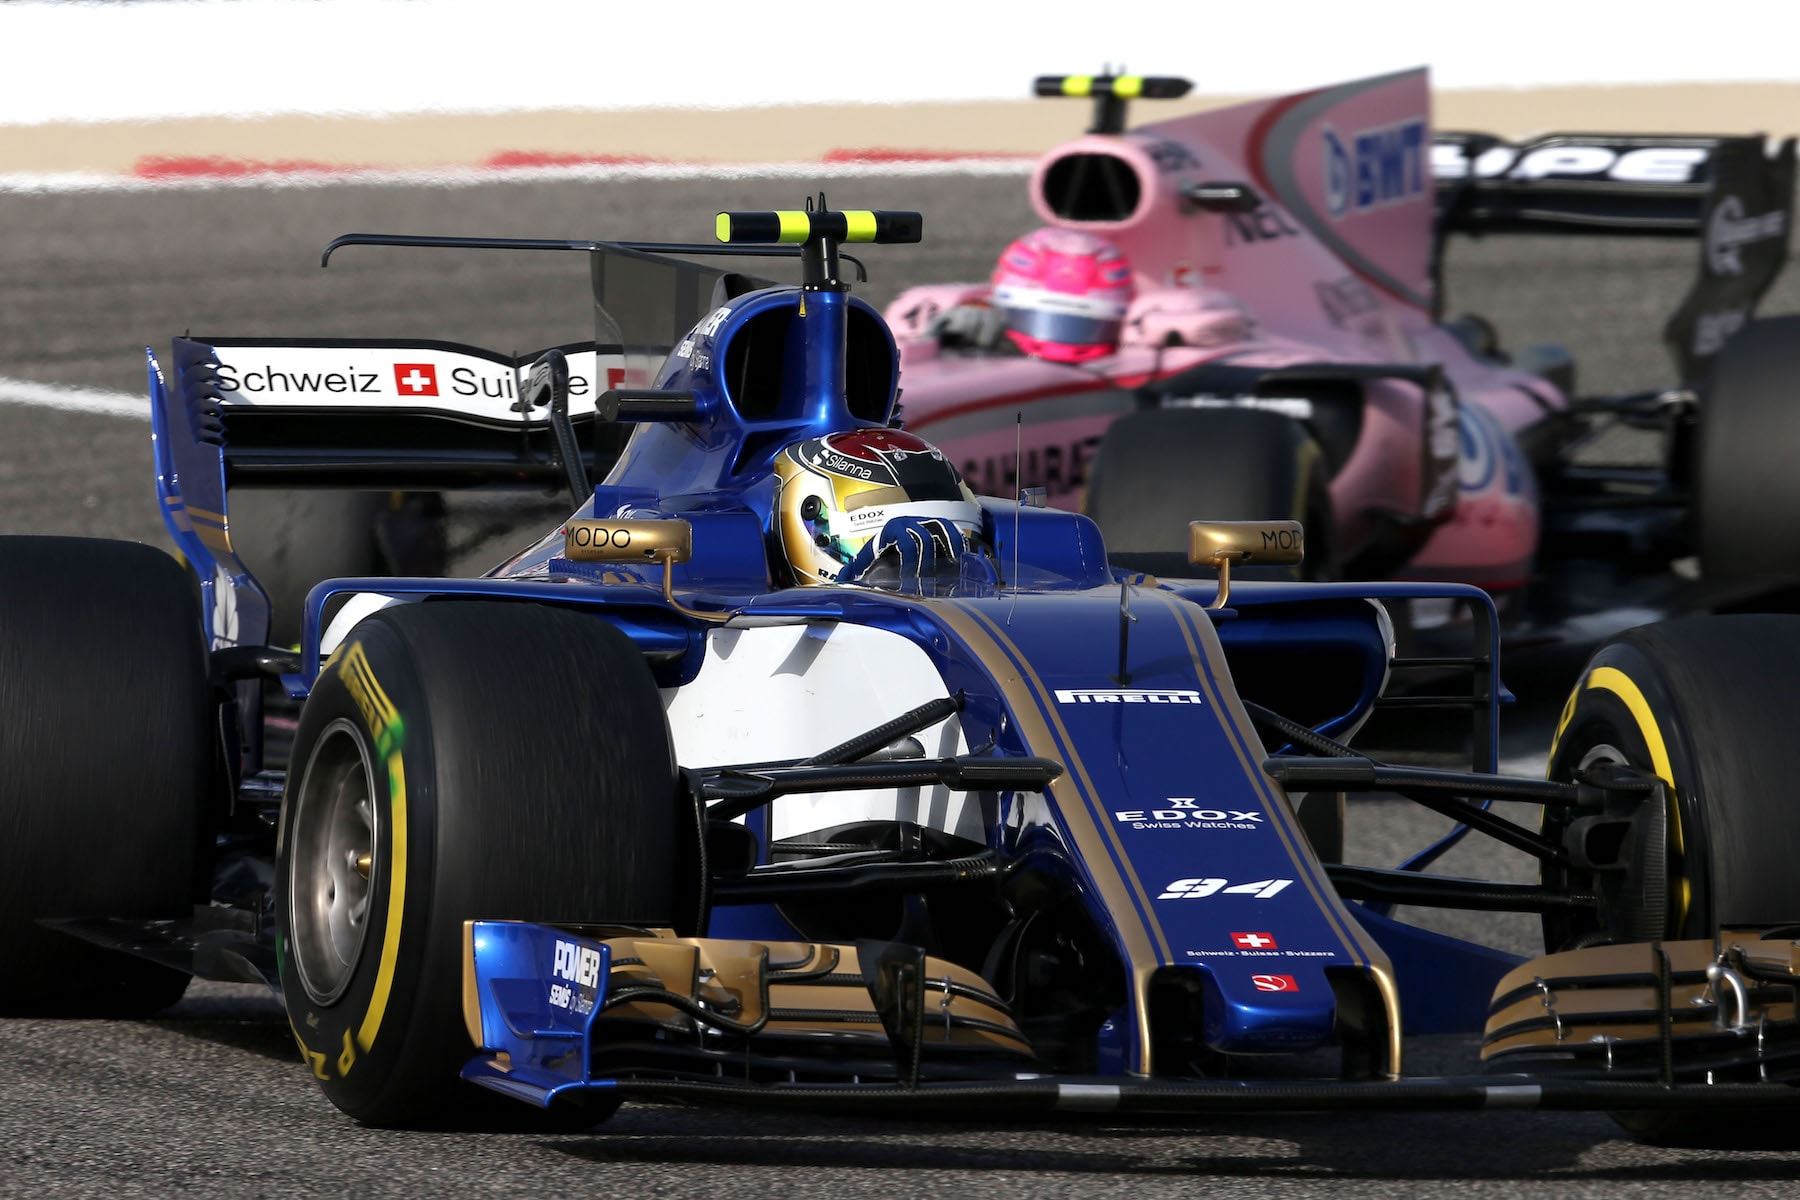 2017 Pascal Wehrlein   Sauber C36   2017 Bahrain GP FP2 1 copy.jpg